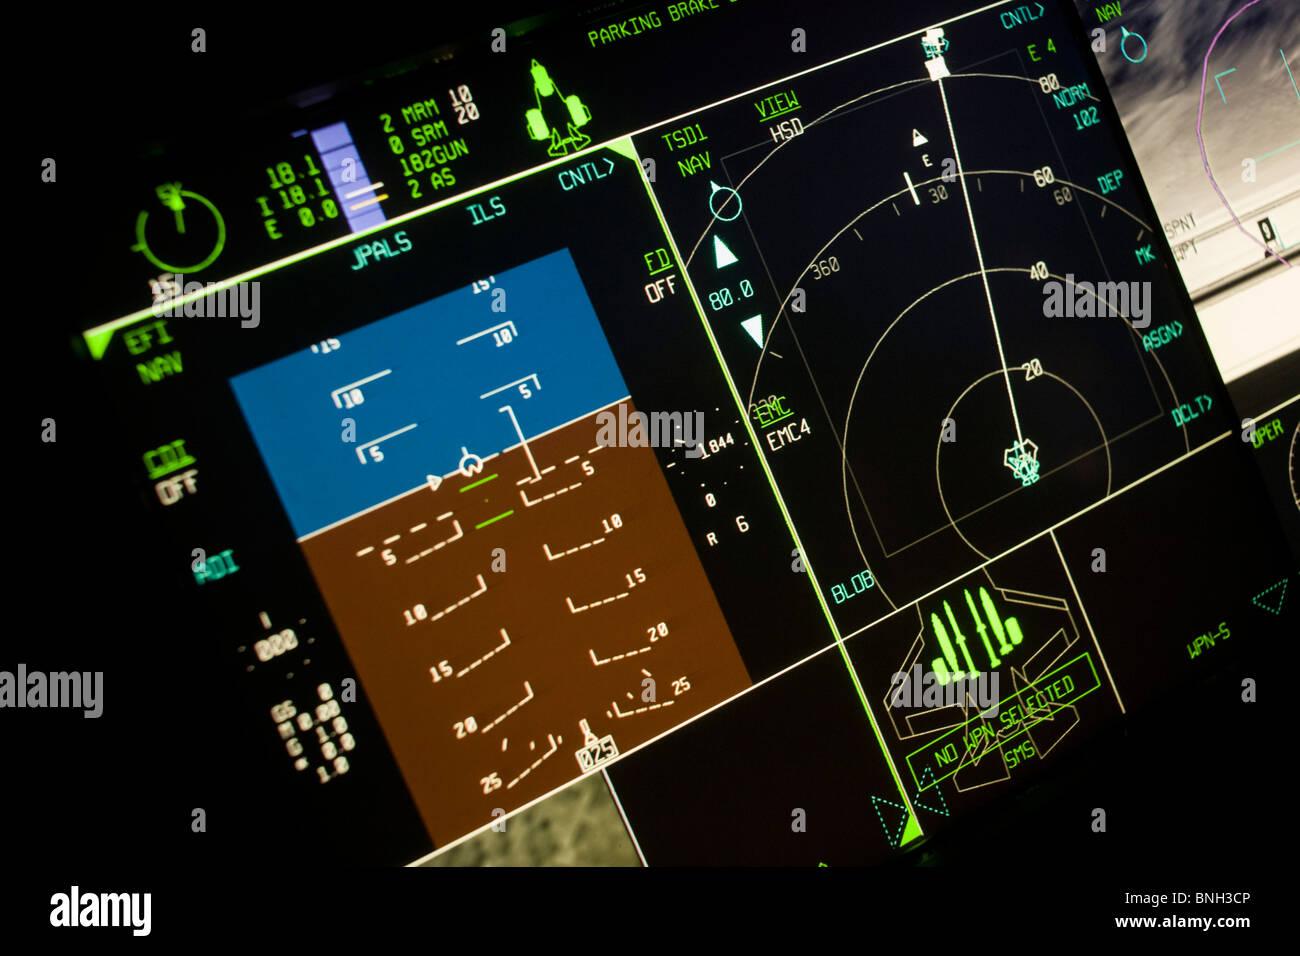 Glowing simulator cockpit instrumentation of a Lockheed Martin F-35 Lightning II stealth fighter. - Stock Image